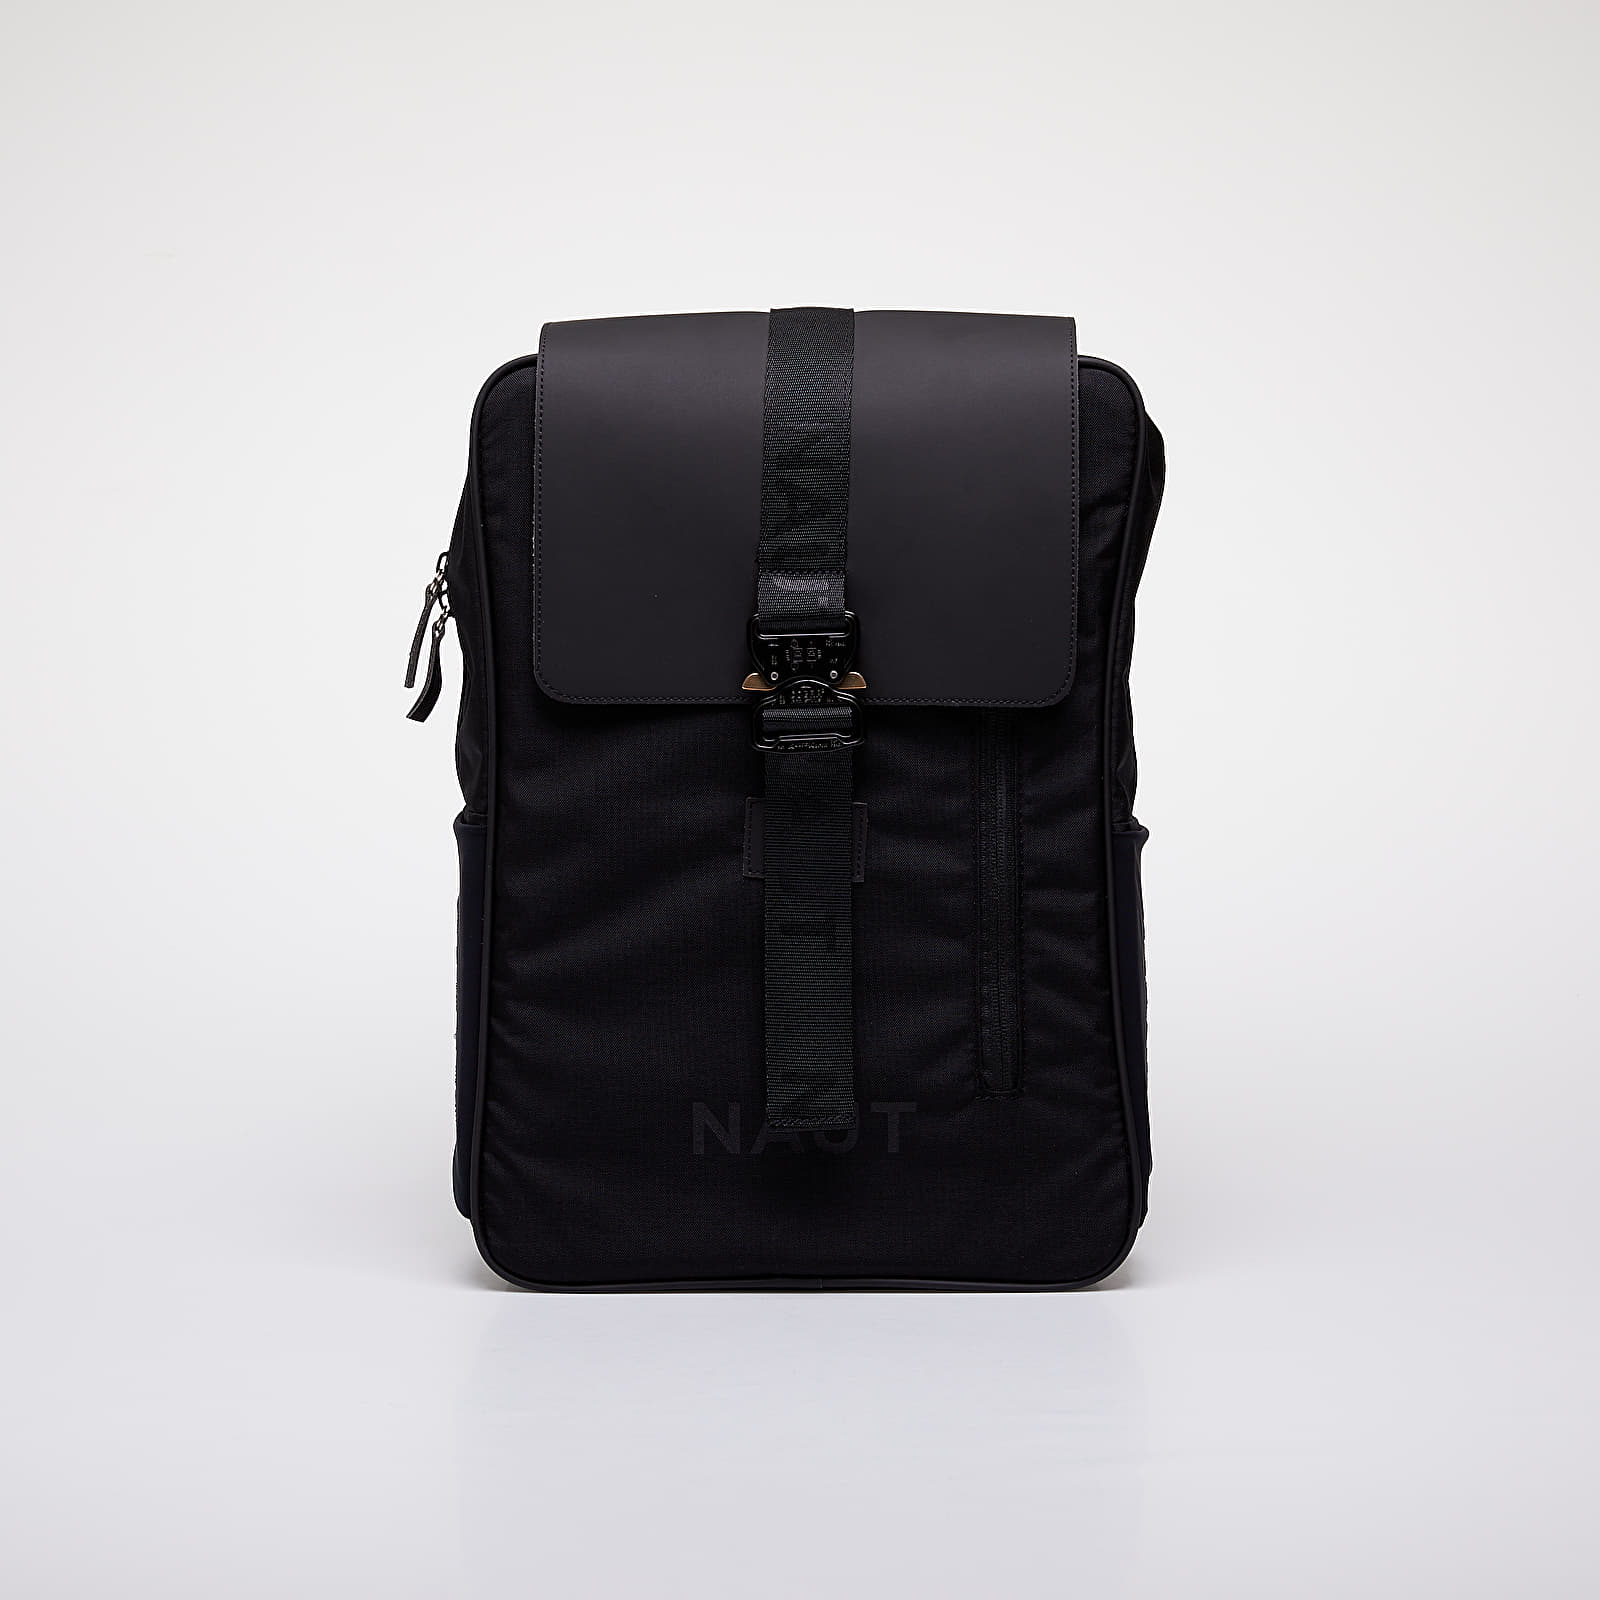 NAUT Strato Backpack